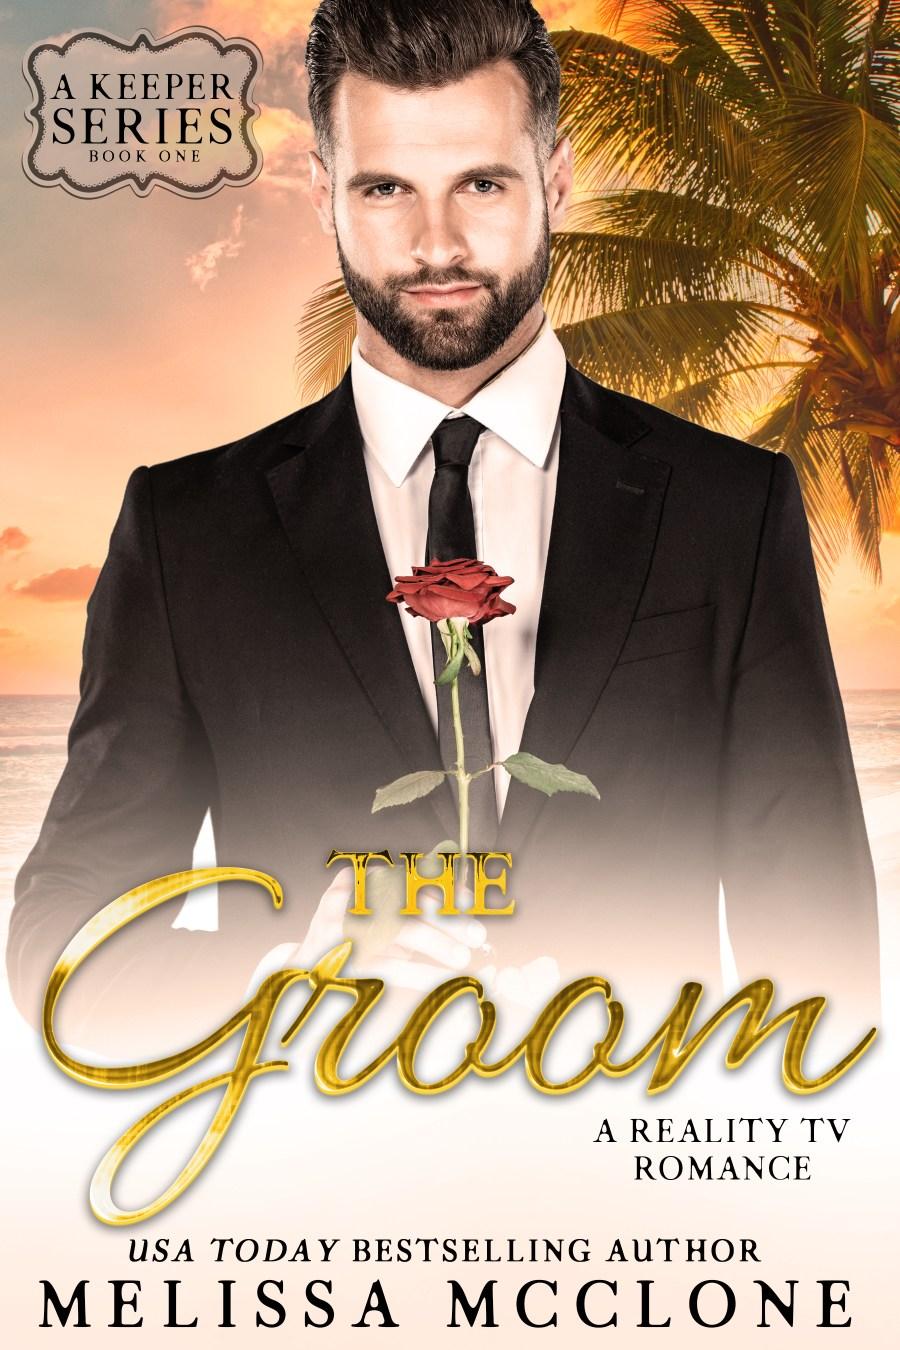 The Groom: A Reality TV Romance (A Keeper Series, #1)